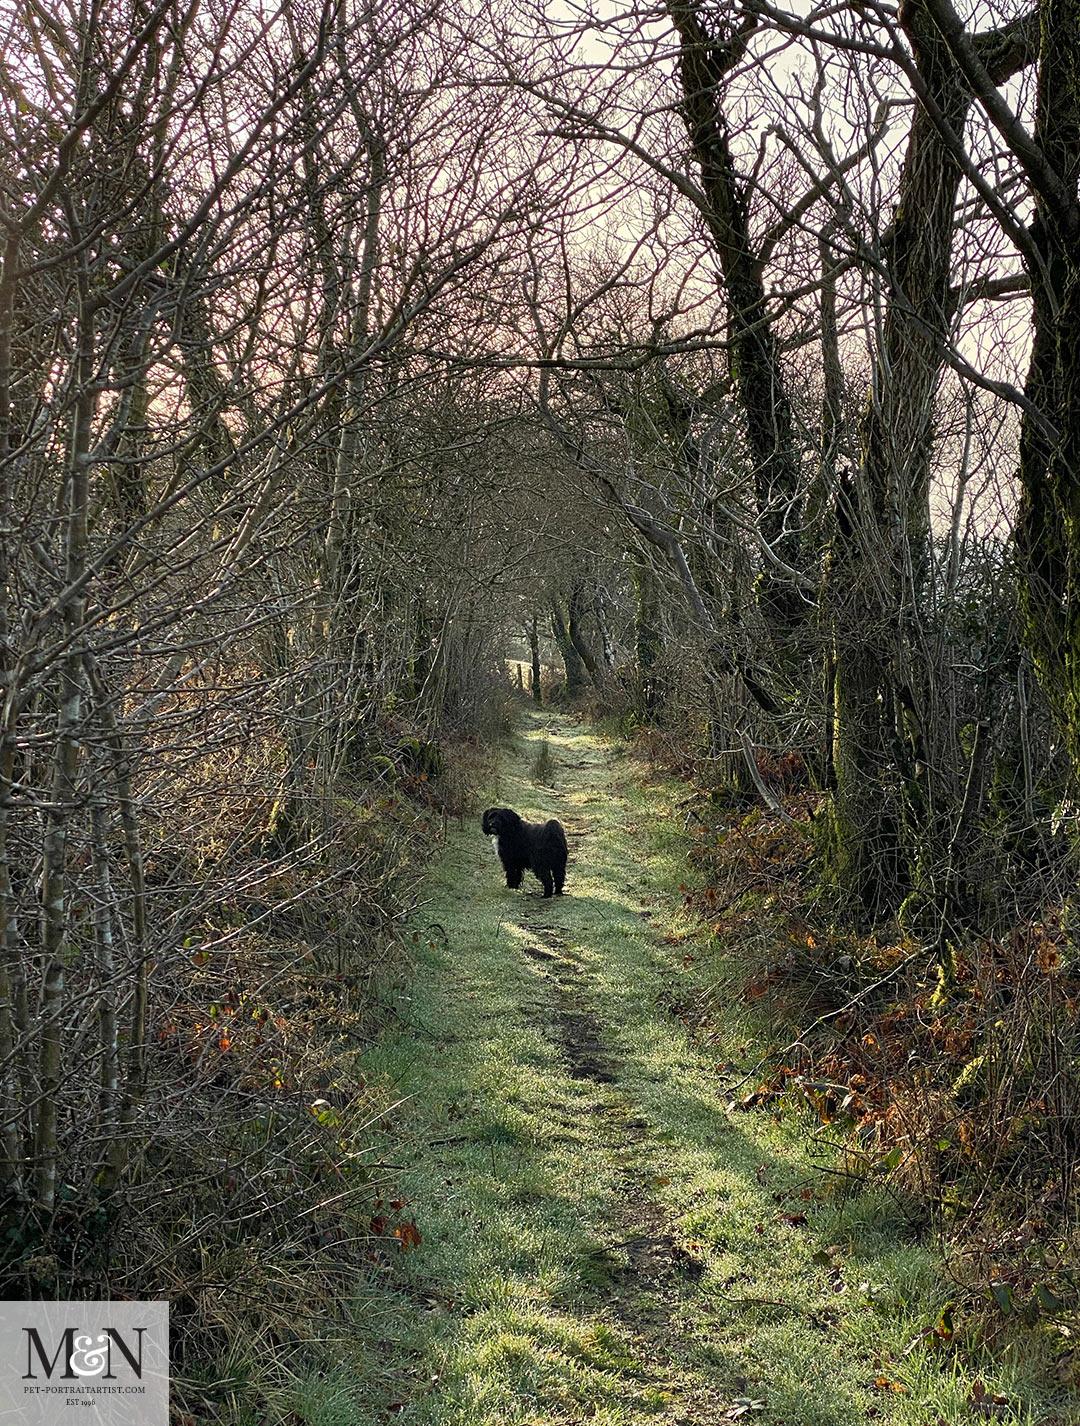 Lilys track